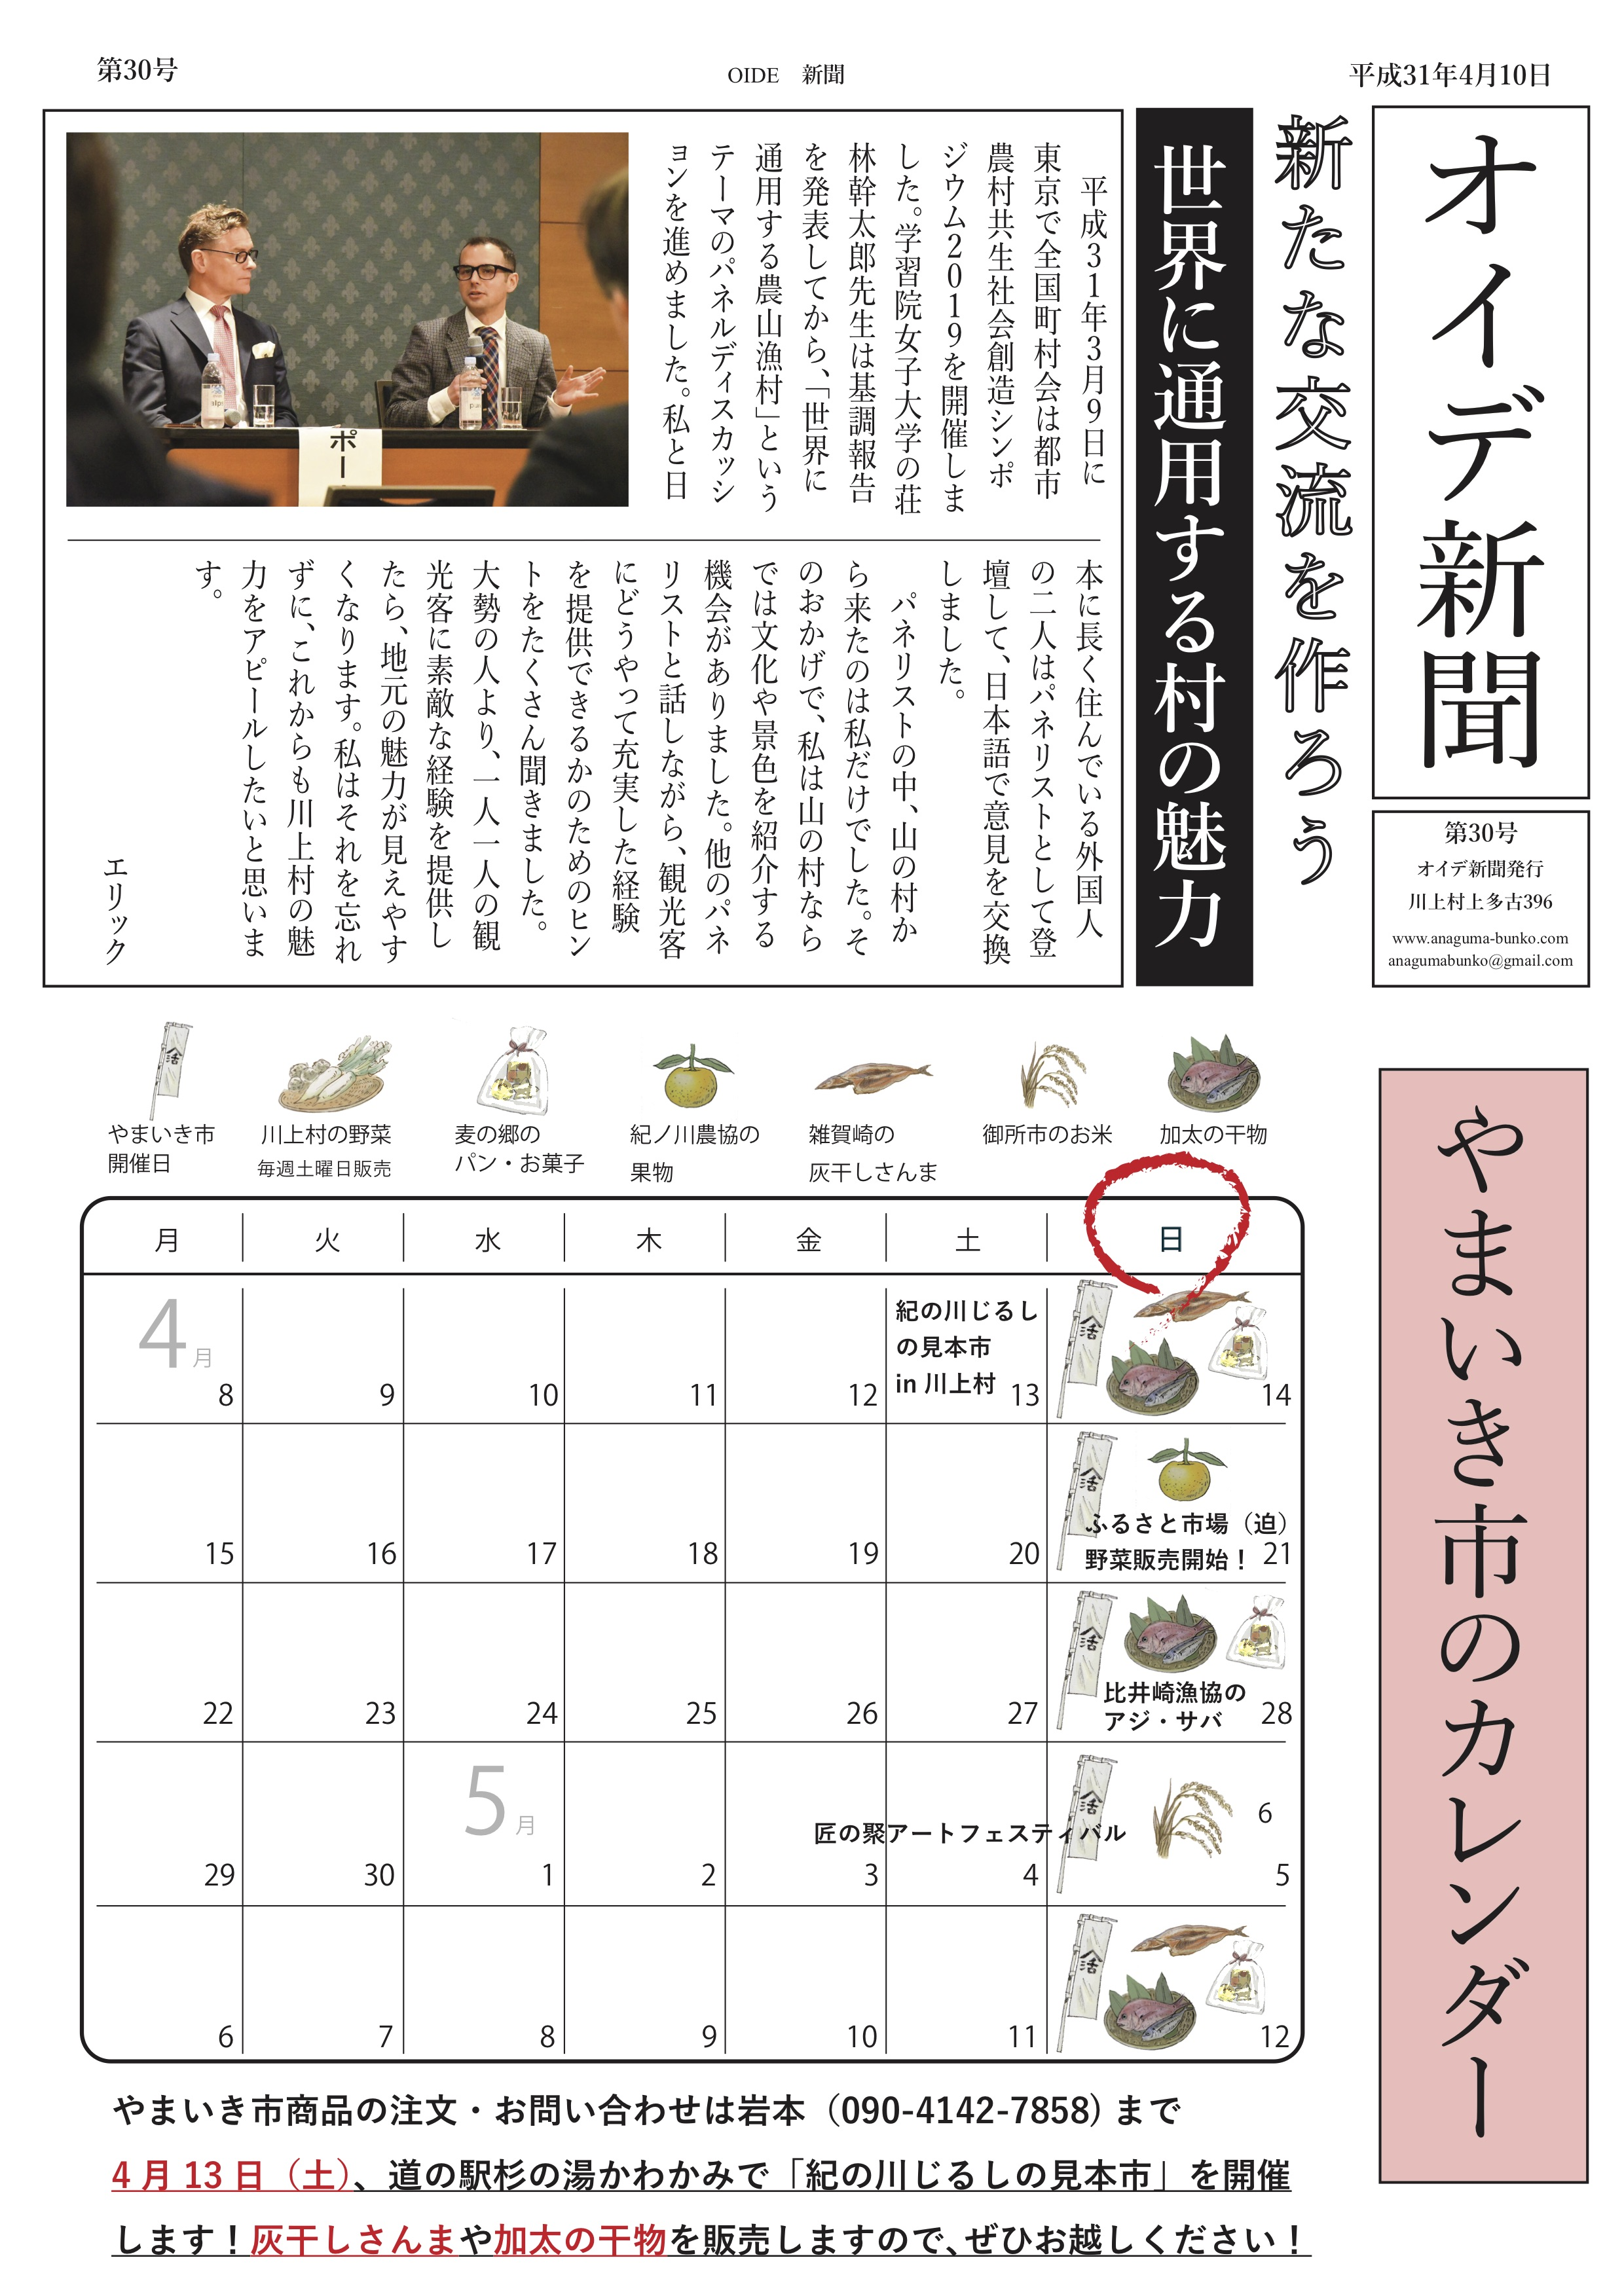 oide新聞31年4月号表.jpg